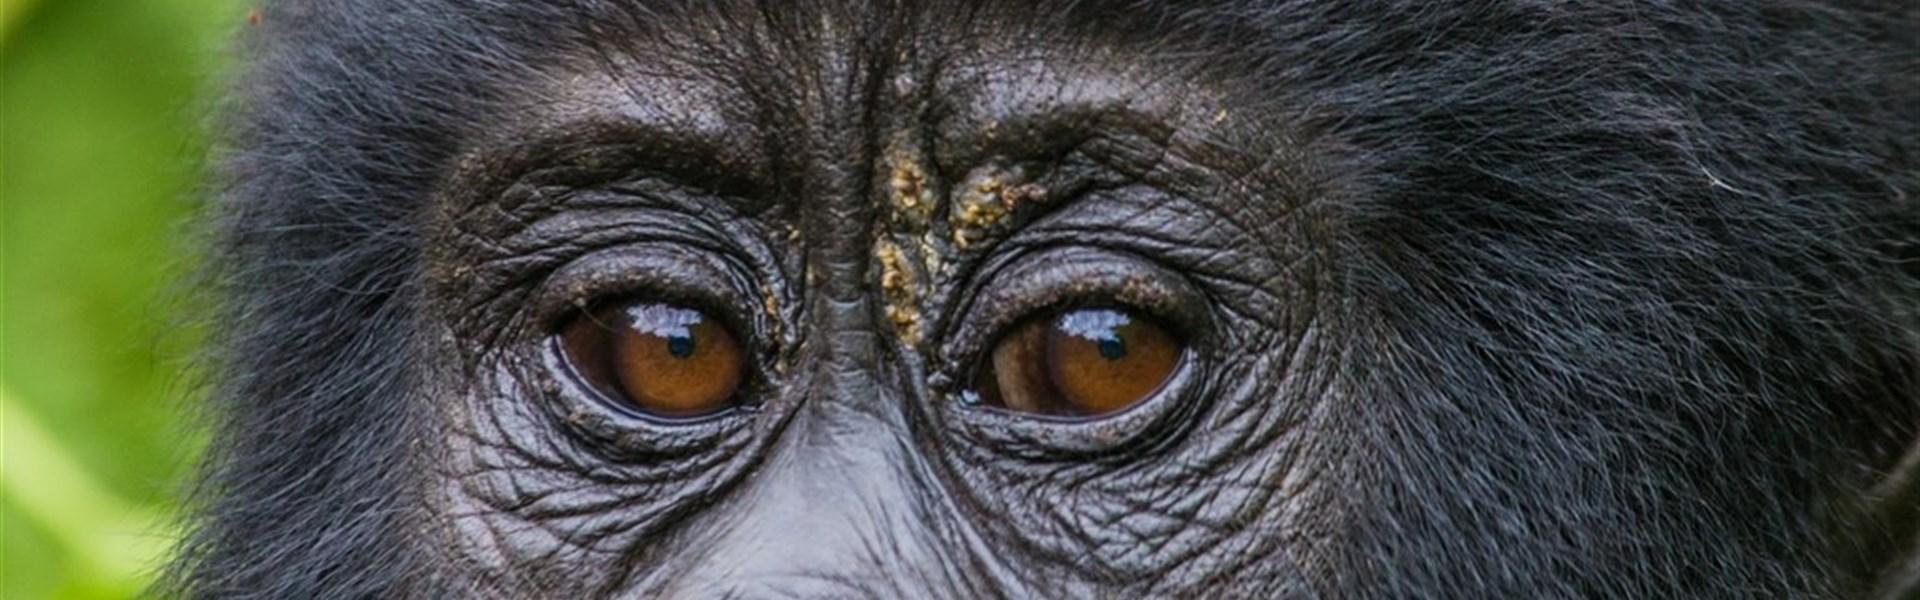 Safari v Ugandě - Cesta za gorilami s českým průvodcem -